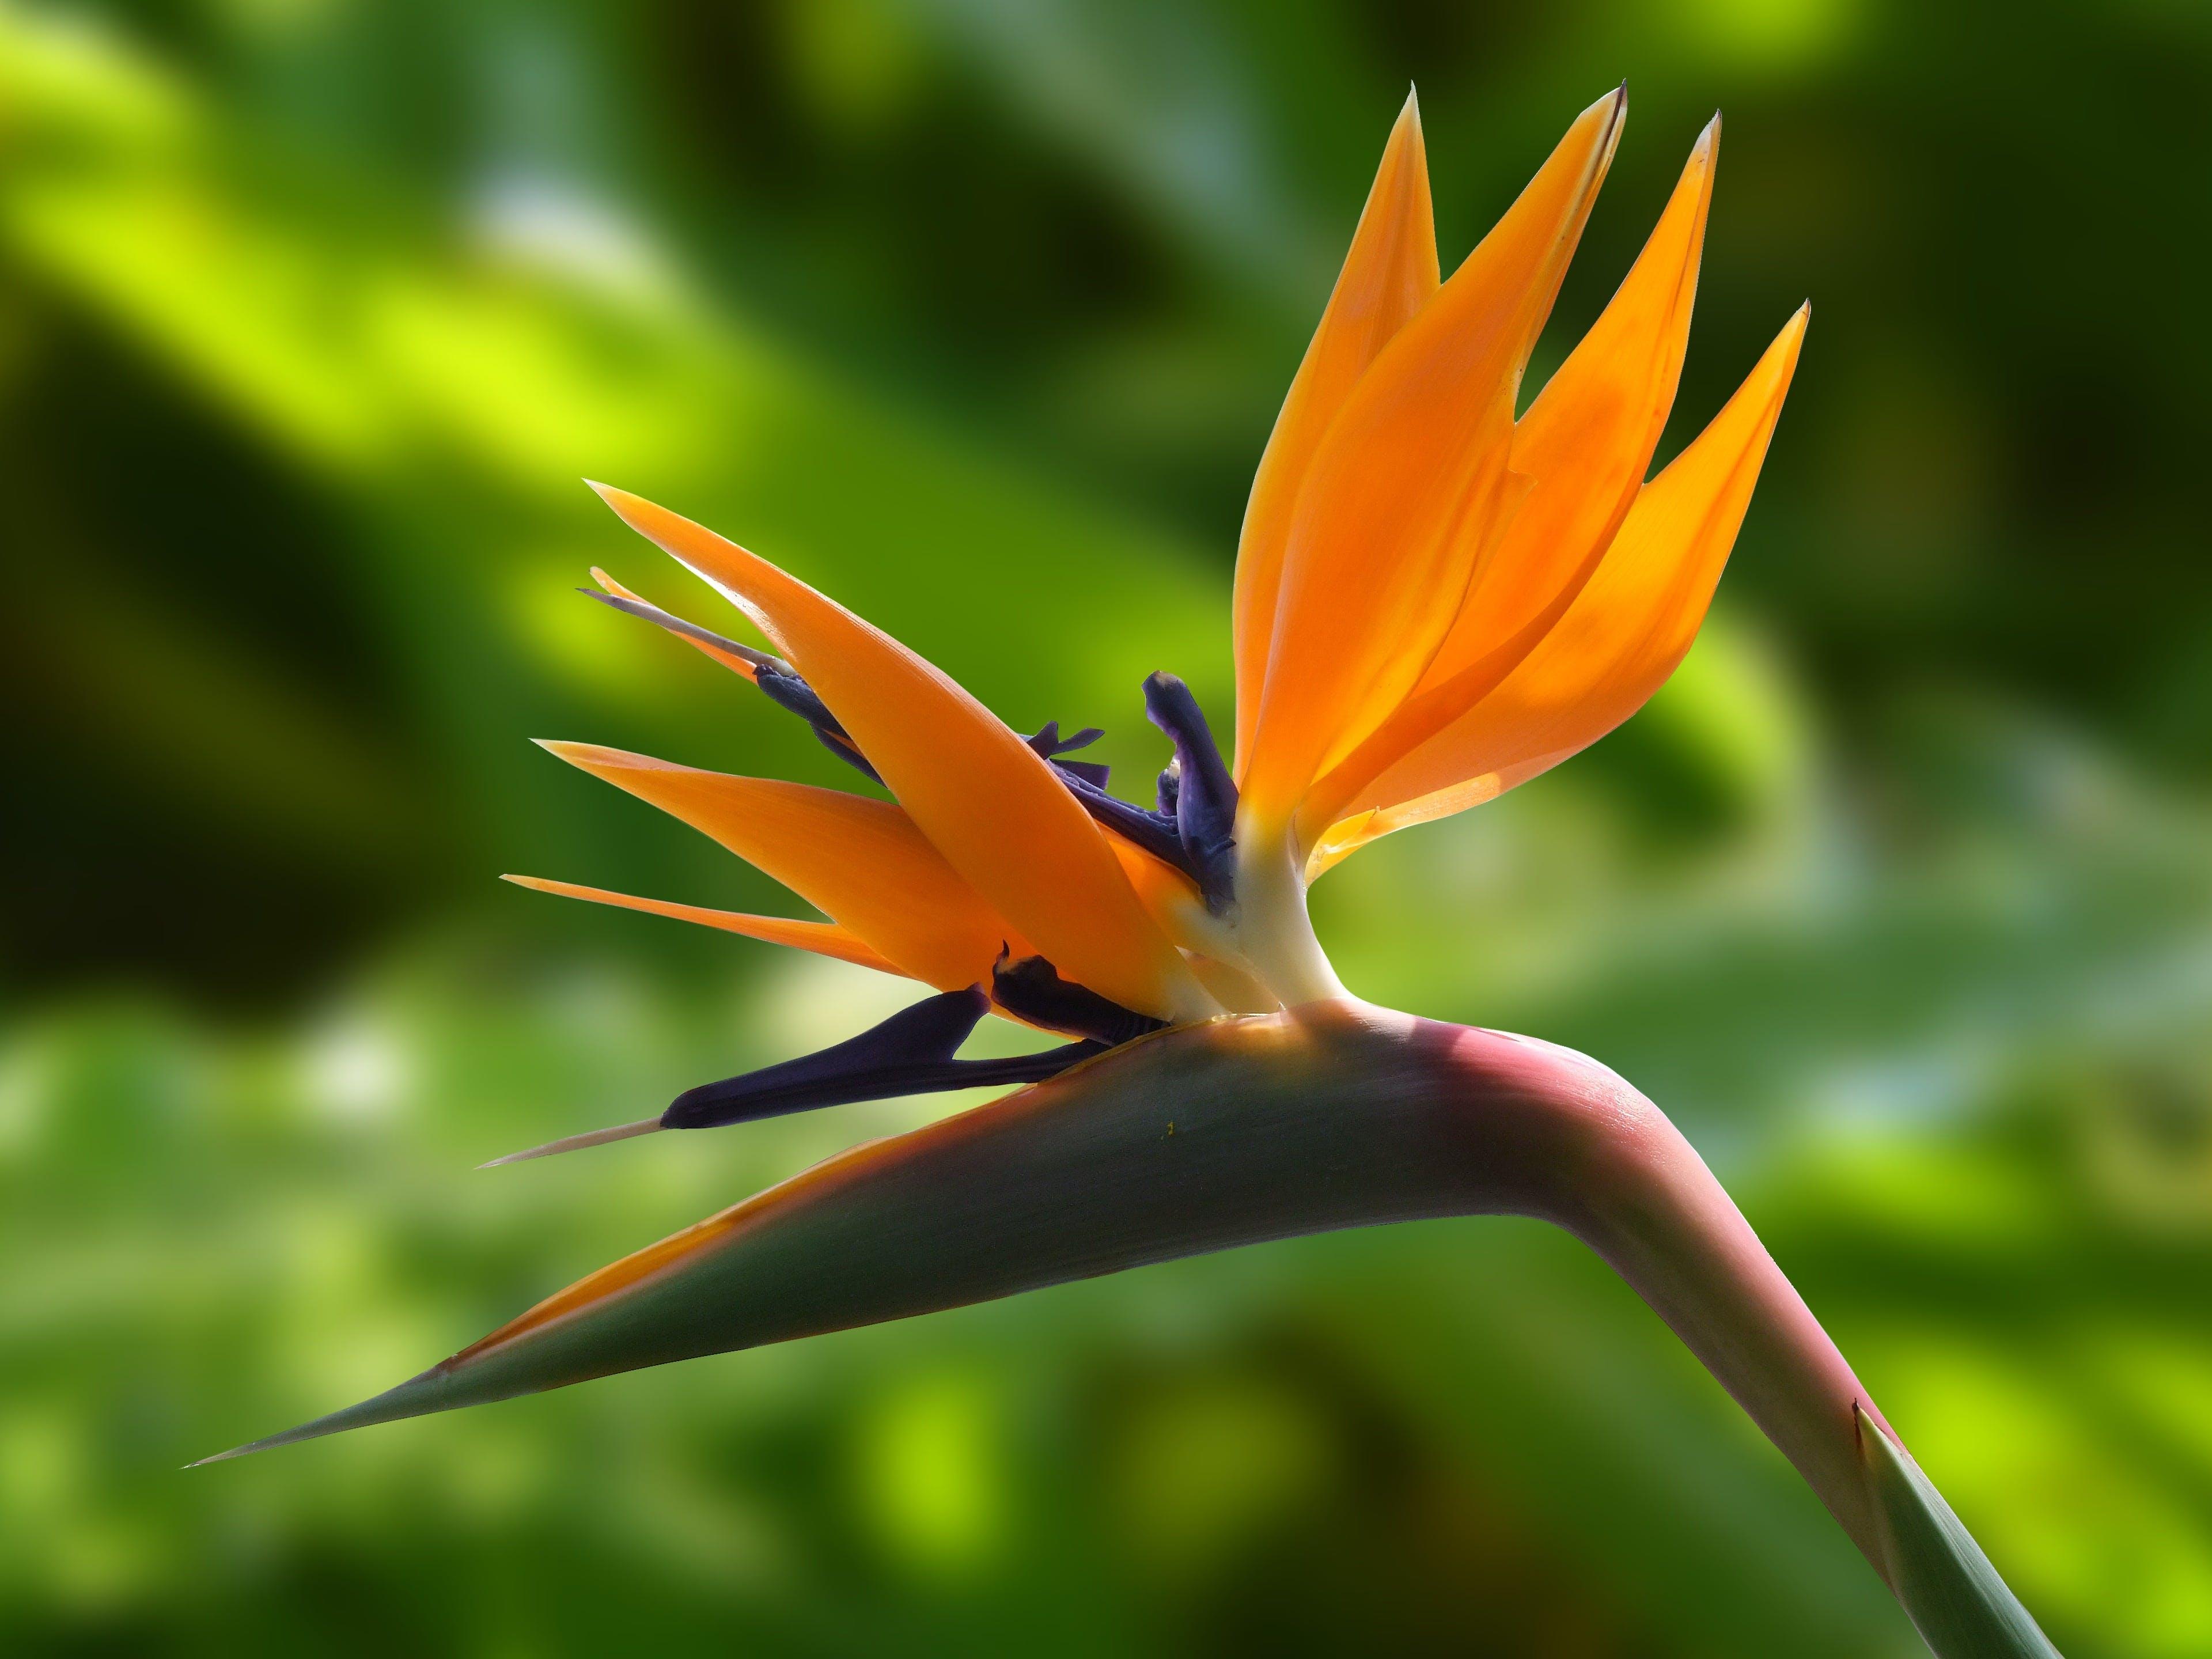 Macro Photography of Orange Flower